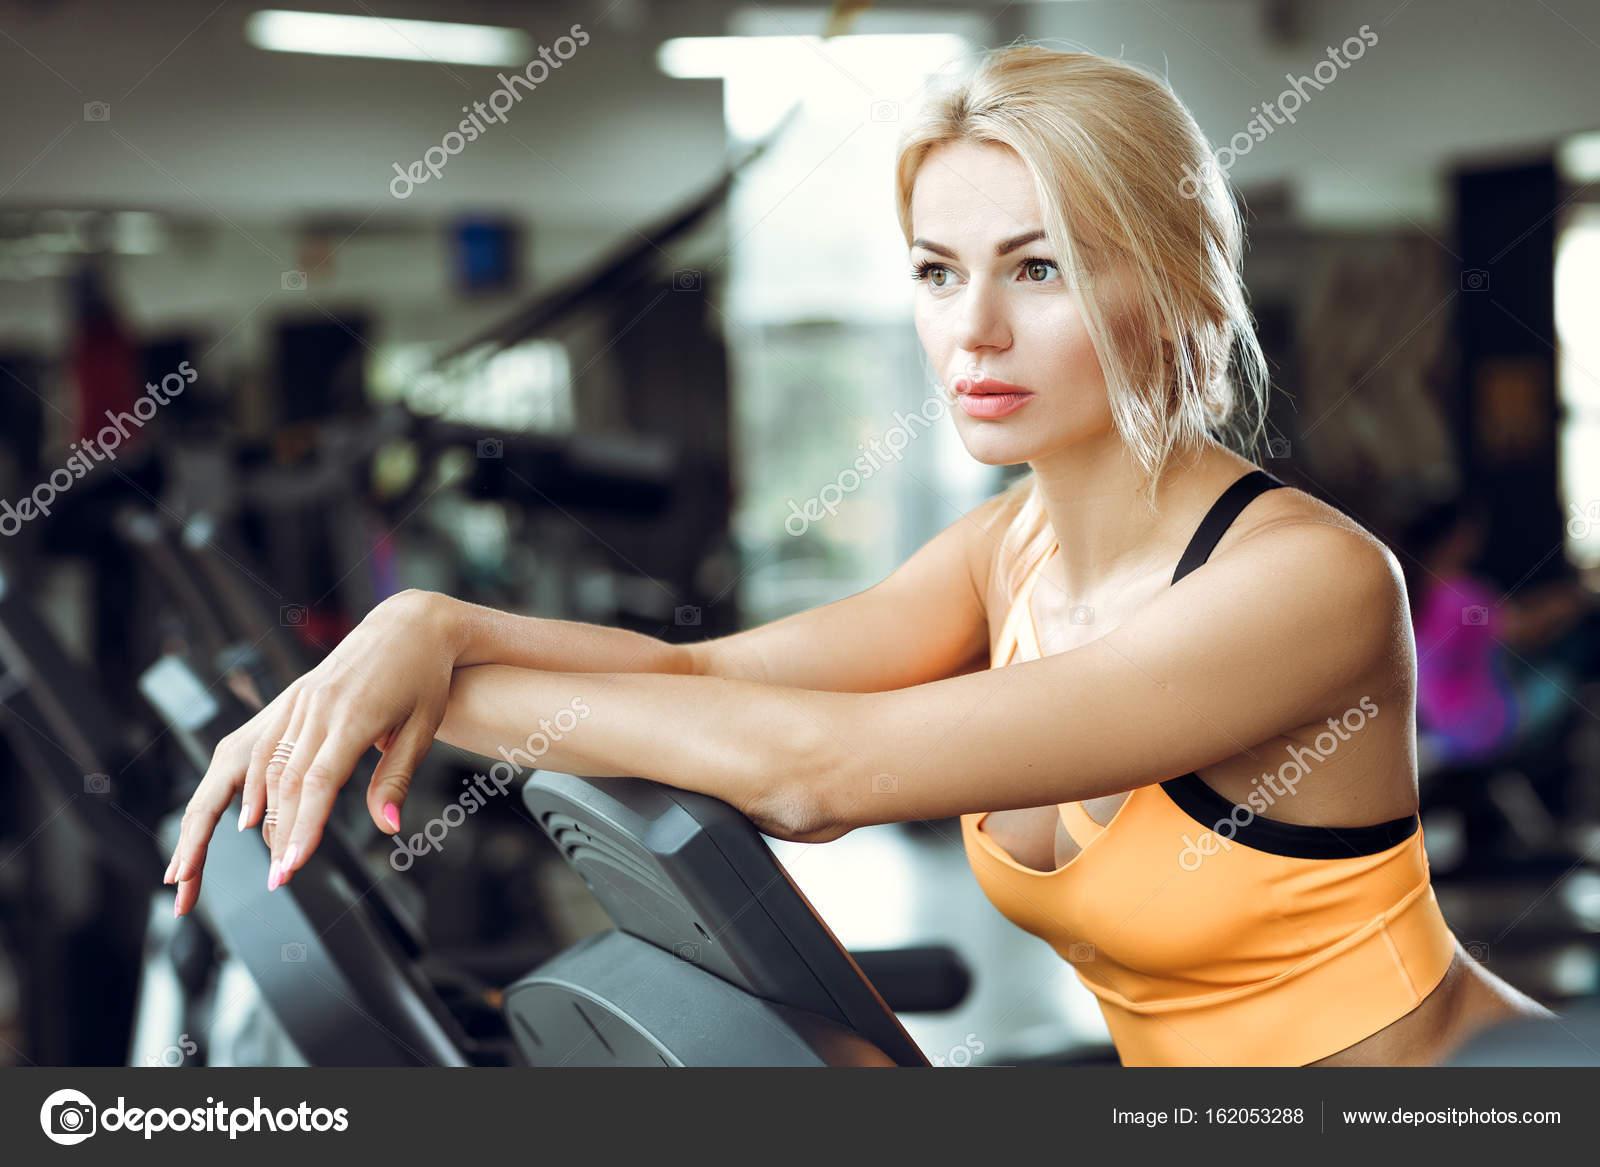 seance salle de sport femme